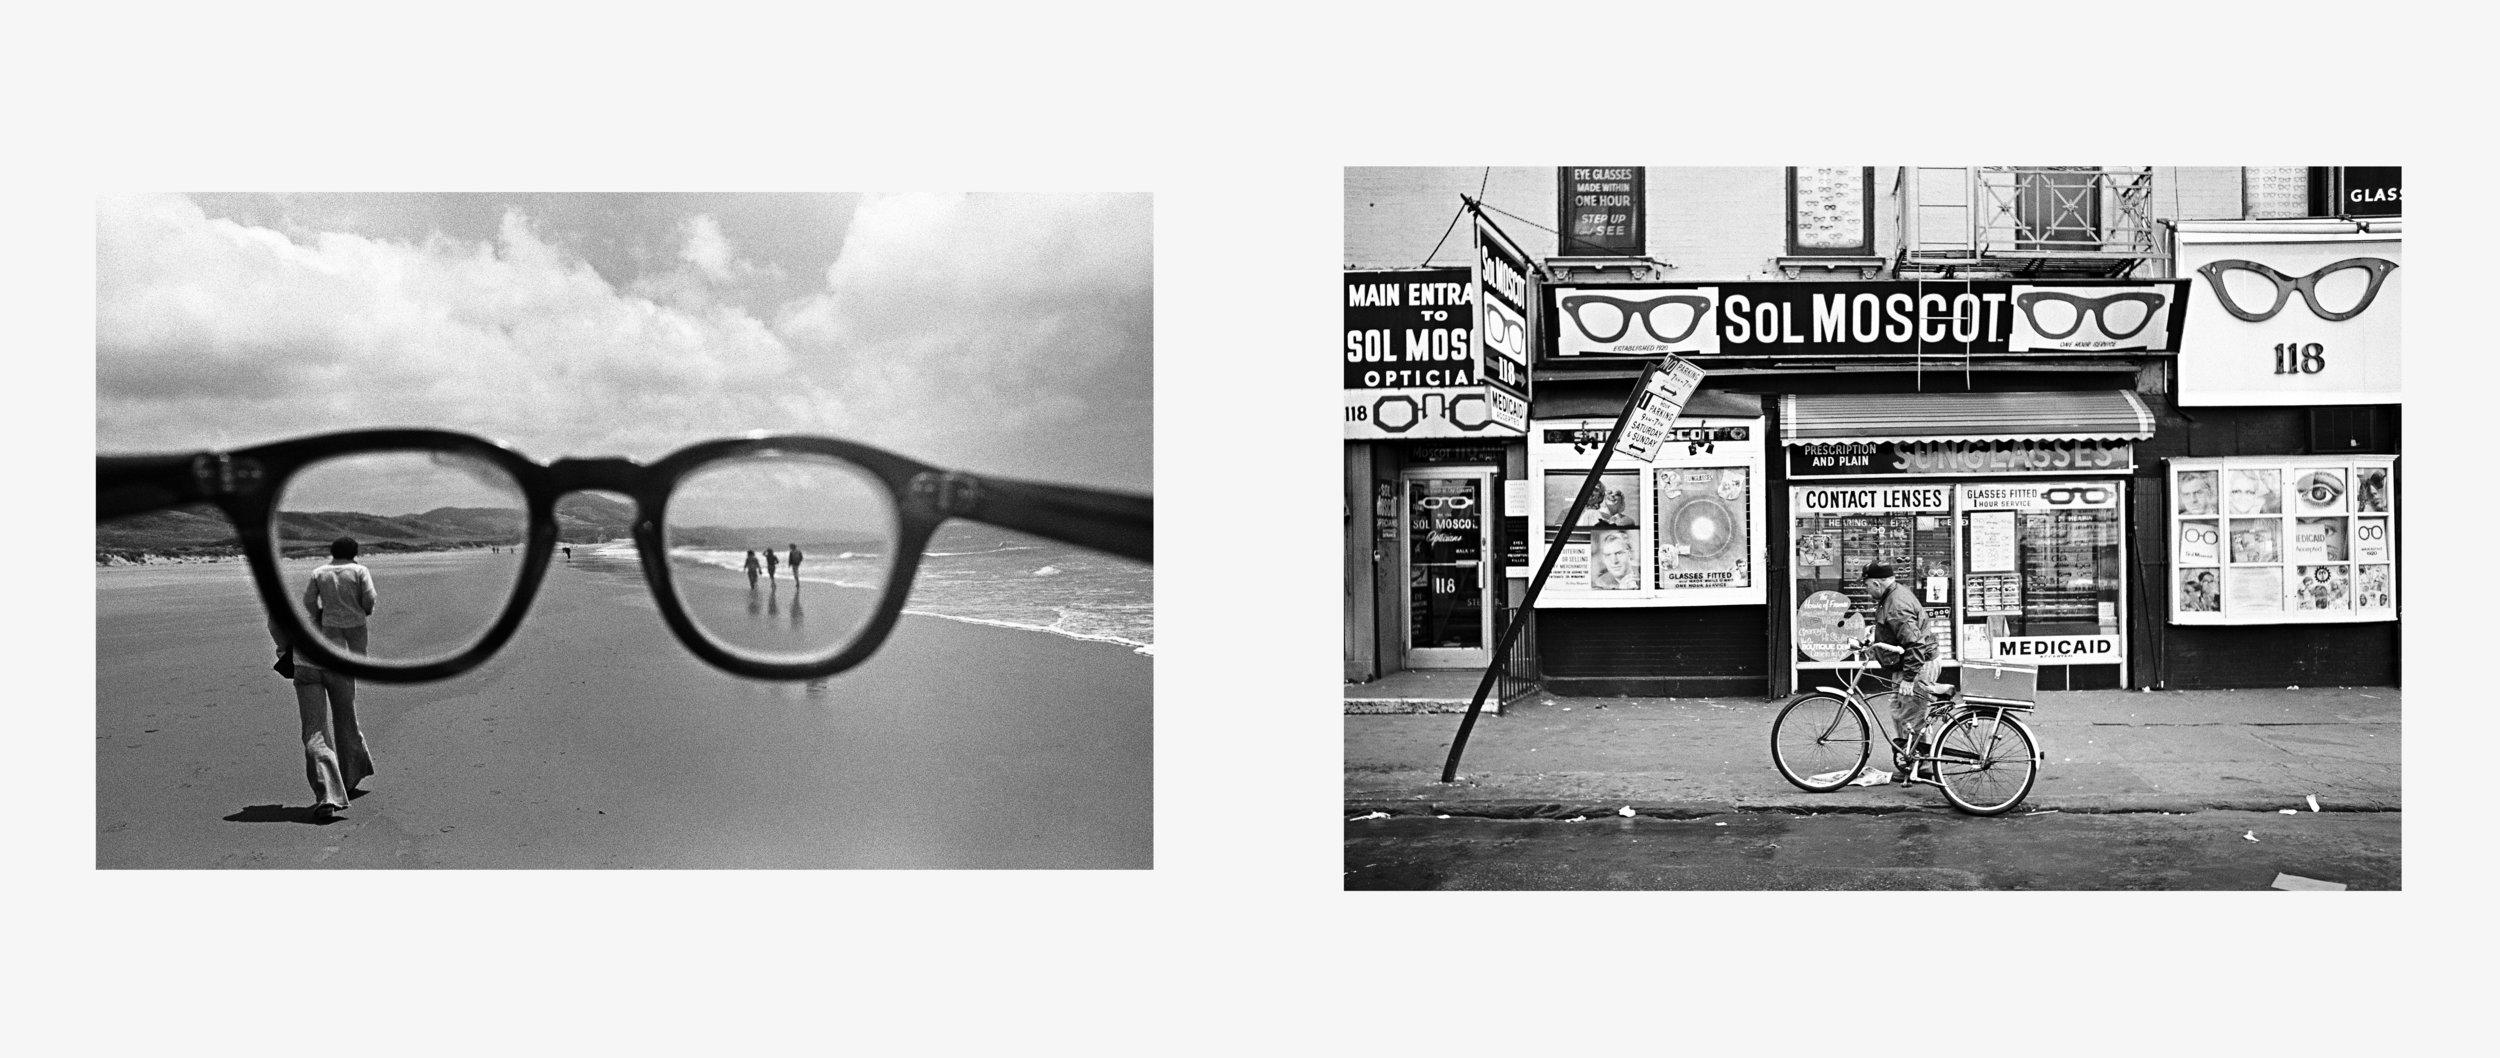 Eyeglasses, California, 1978 | Sol Moscot Optician, New York, 1970 Copyright © Mark Chester from the book  Twosomes  (Un-Gyve Press, Boston). ( PRNewsFoto/Un-Gyve Press )